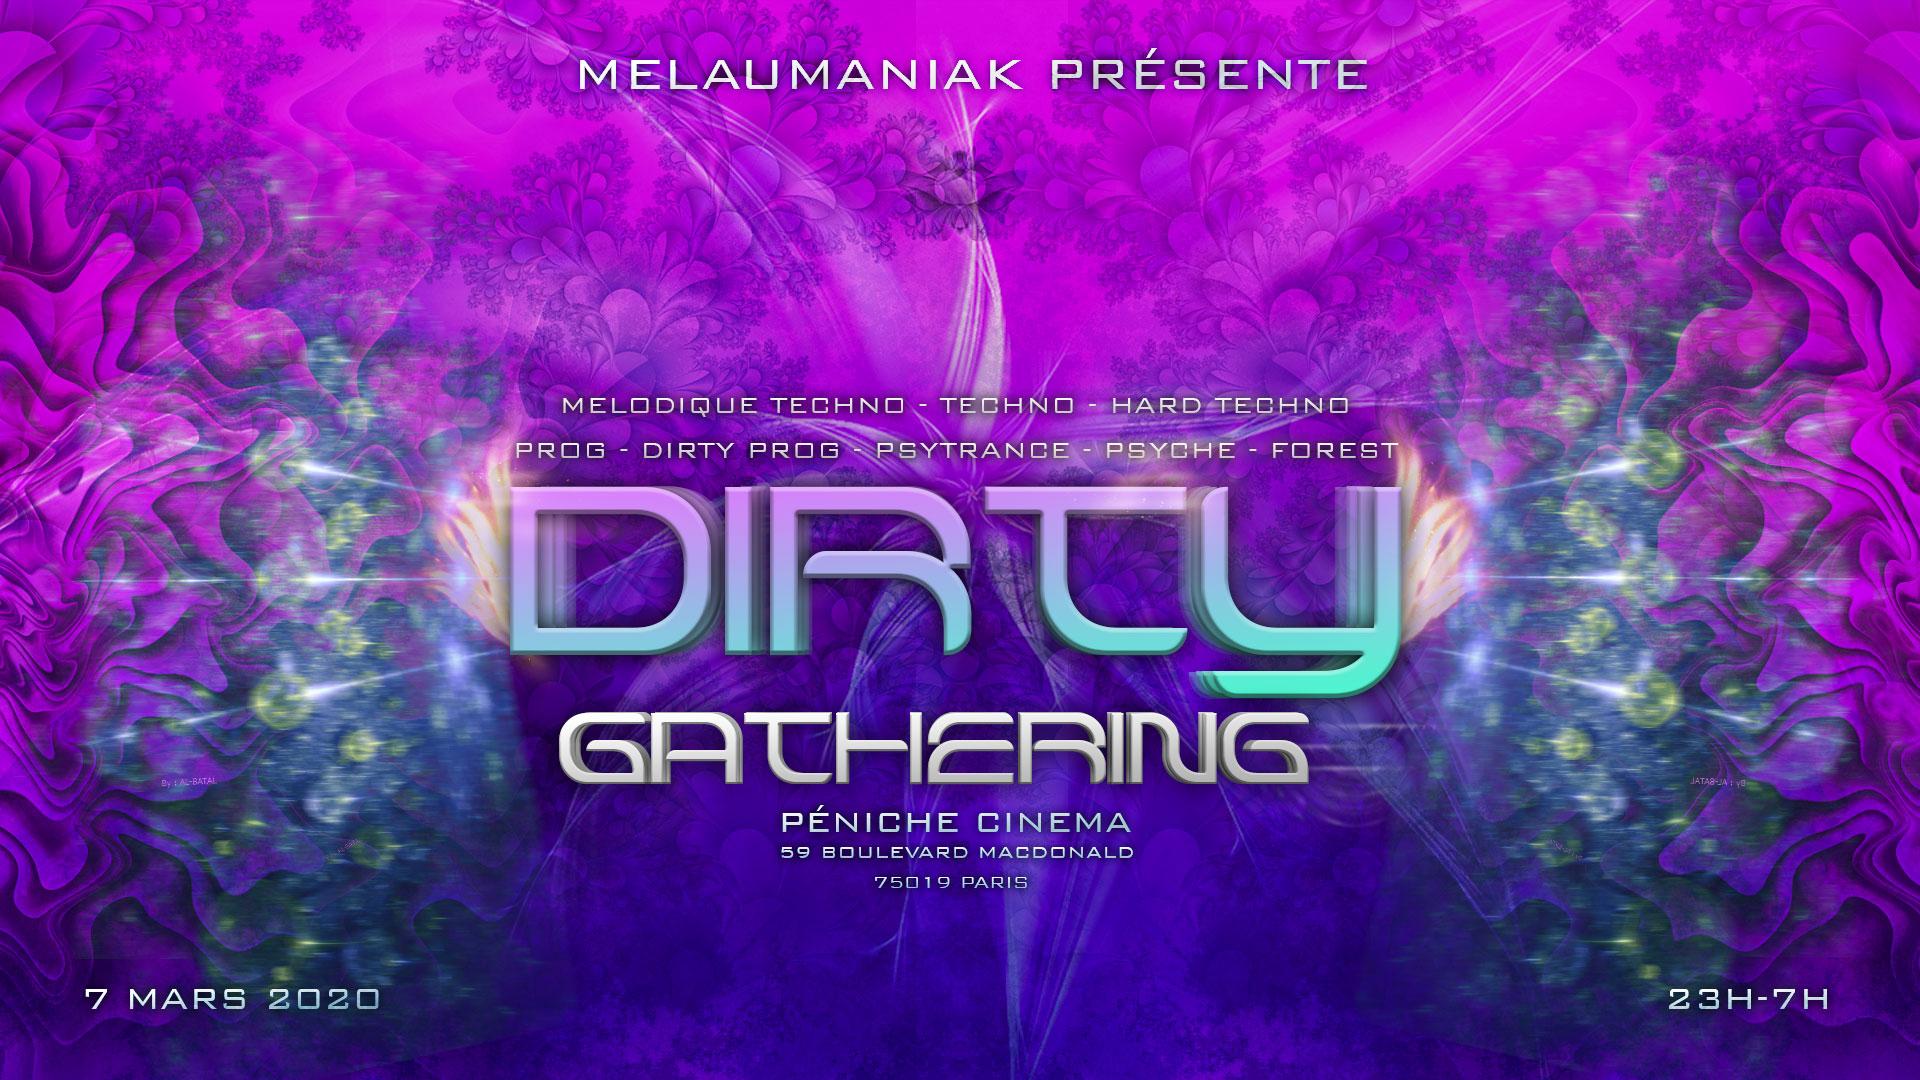 Dirty Gathering by Mélaumaniak